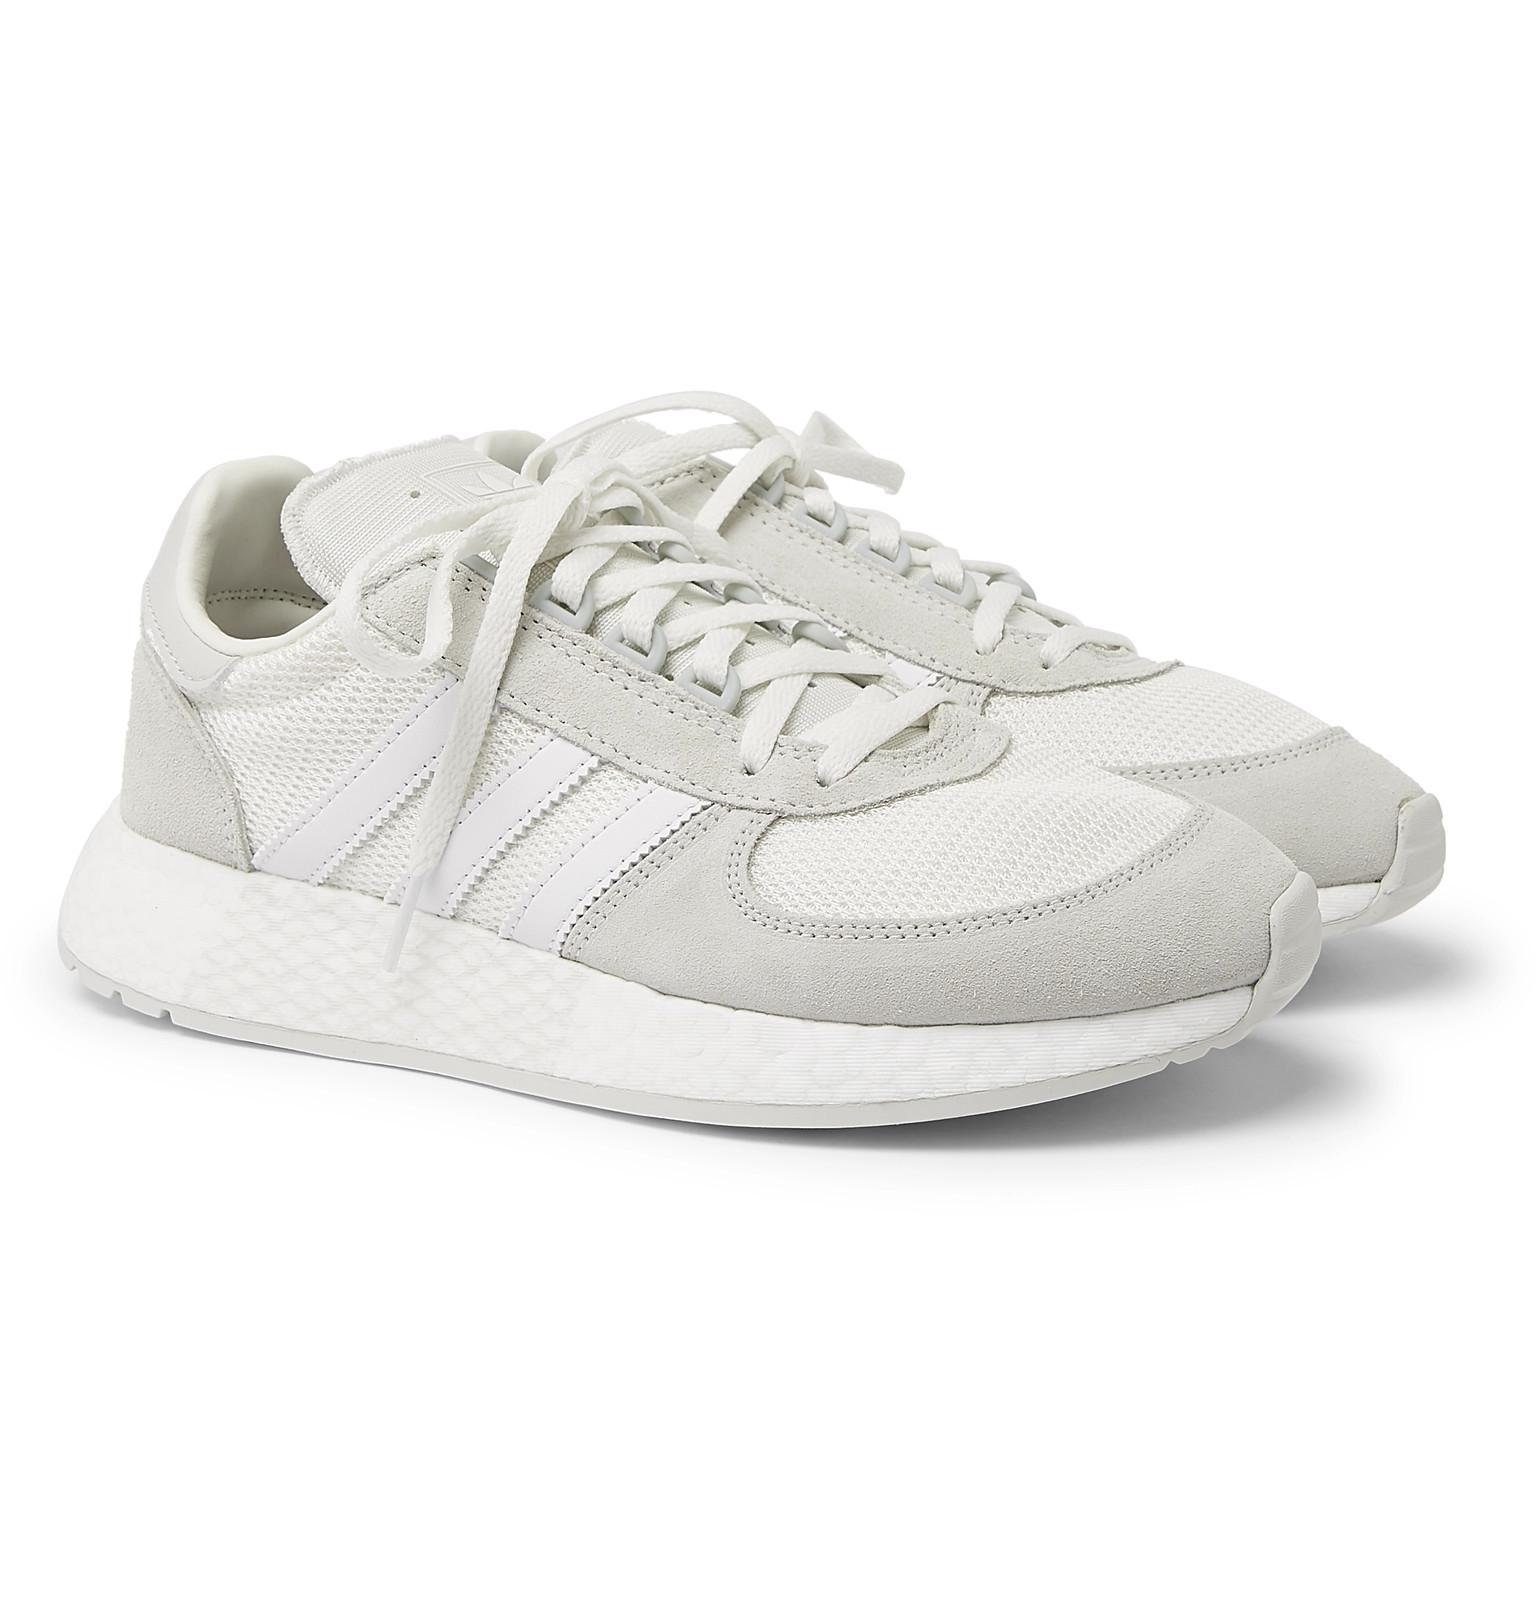 1d074e07e7dc adidas Originals Marathon Boost Suede-trimmed Leather And Mesh ...